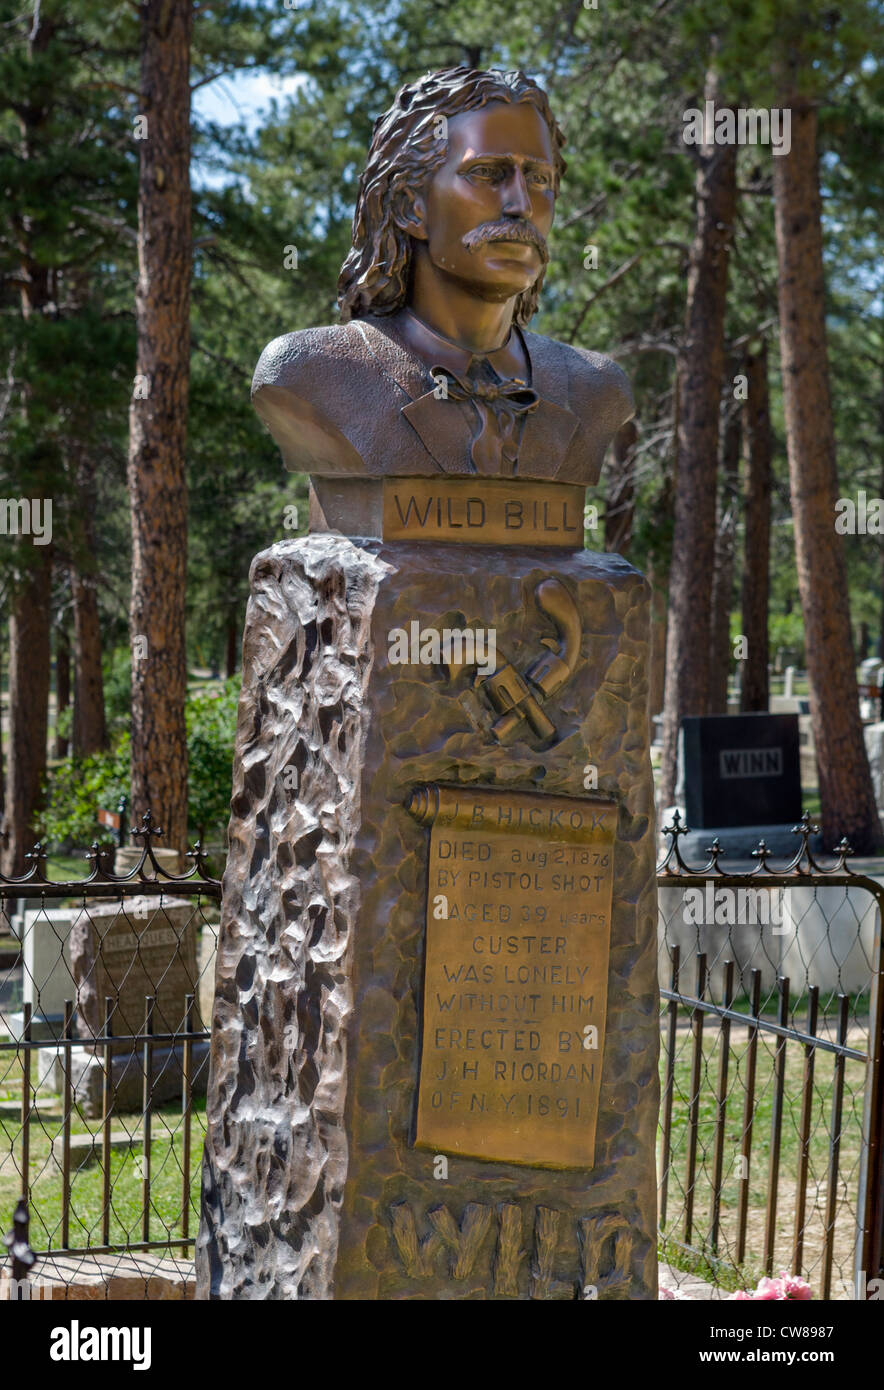 La tumba de Wild Bill Hickok en el Monte Moriah Cemetery, Deadwood, Dakota del Sur, EE.UU. Foto de stock